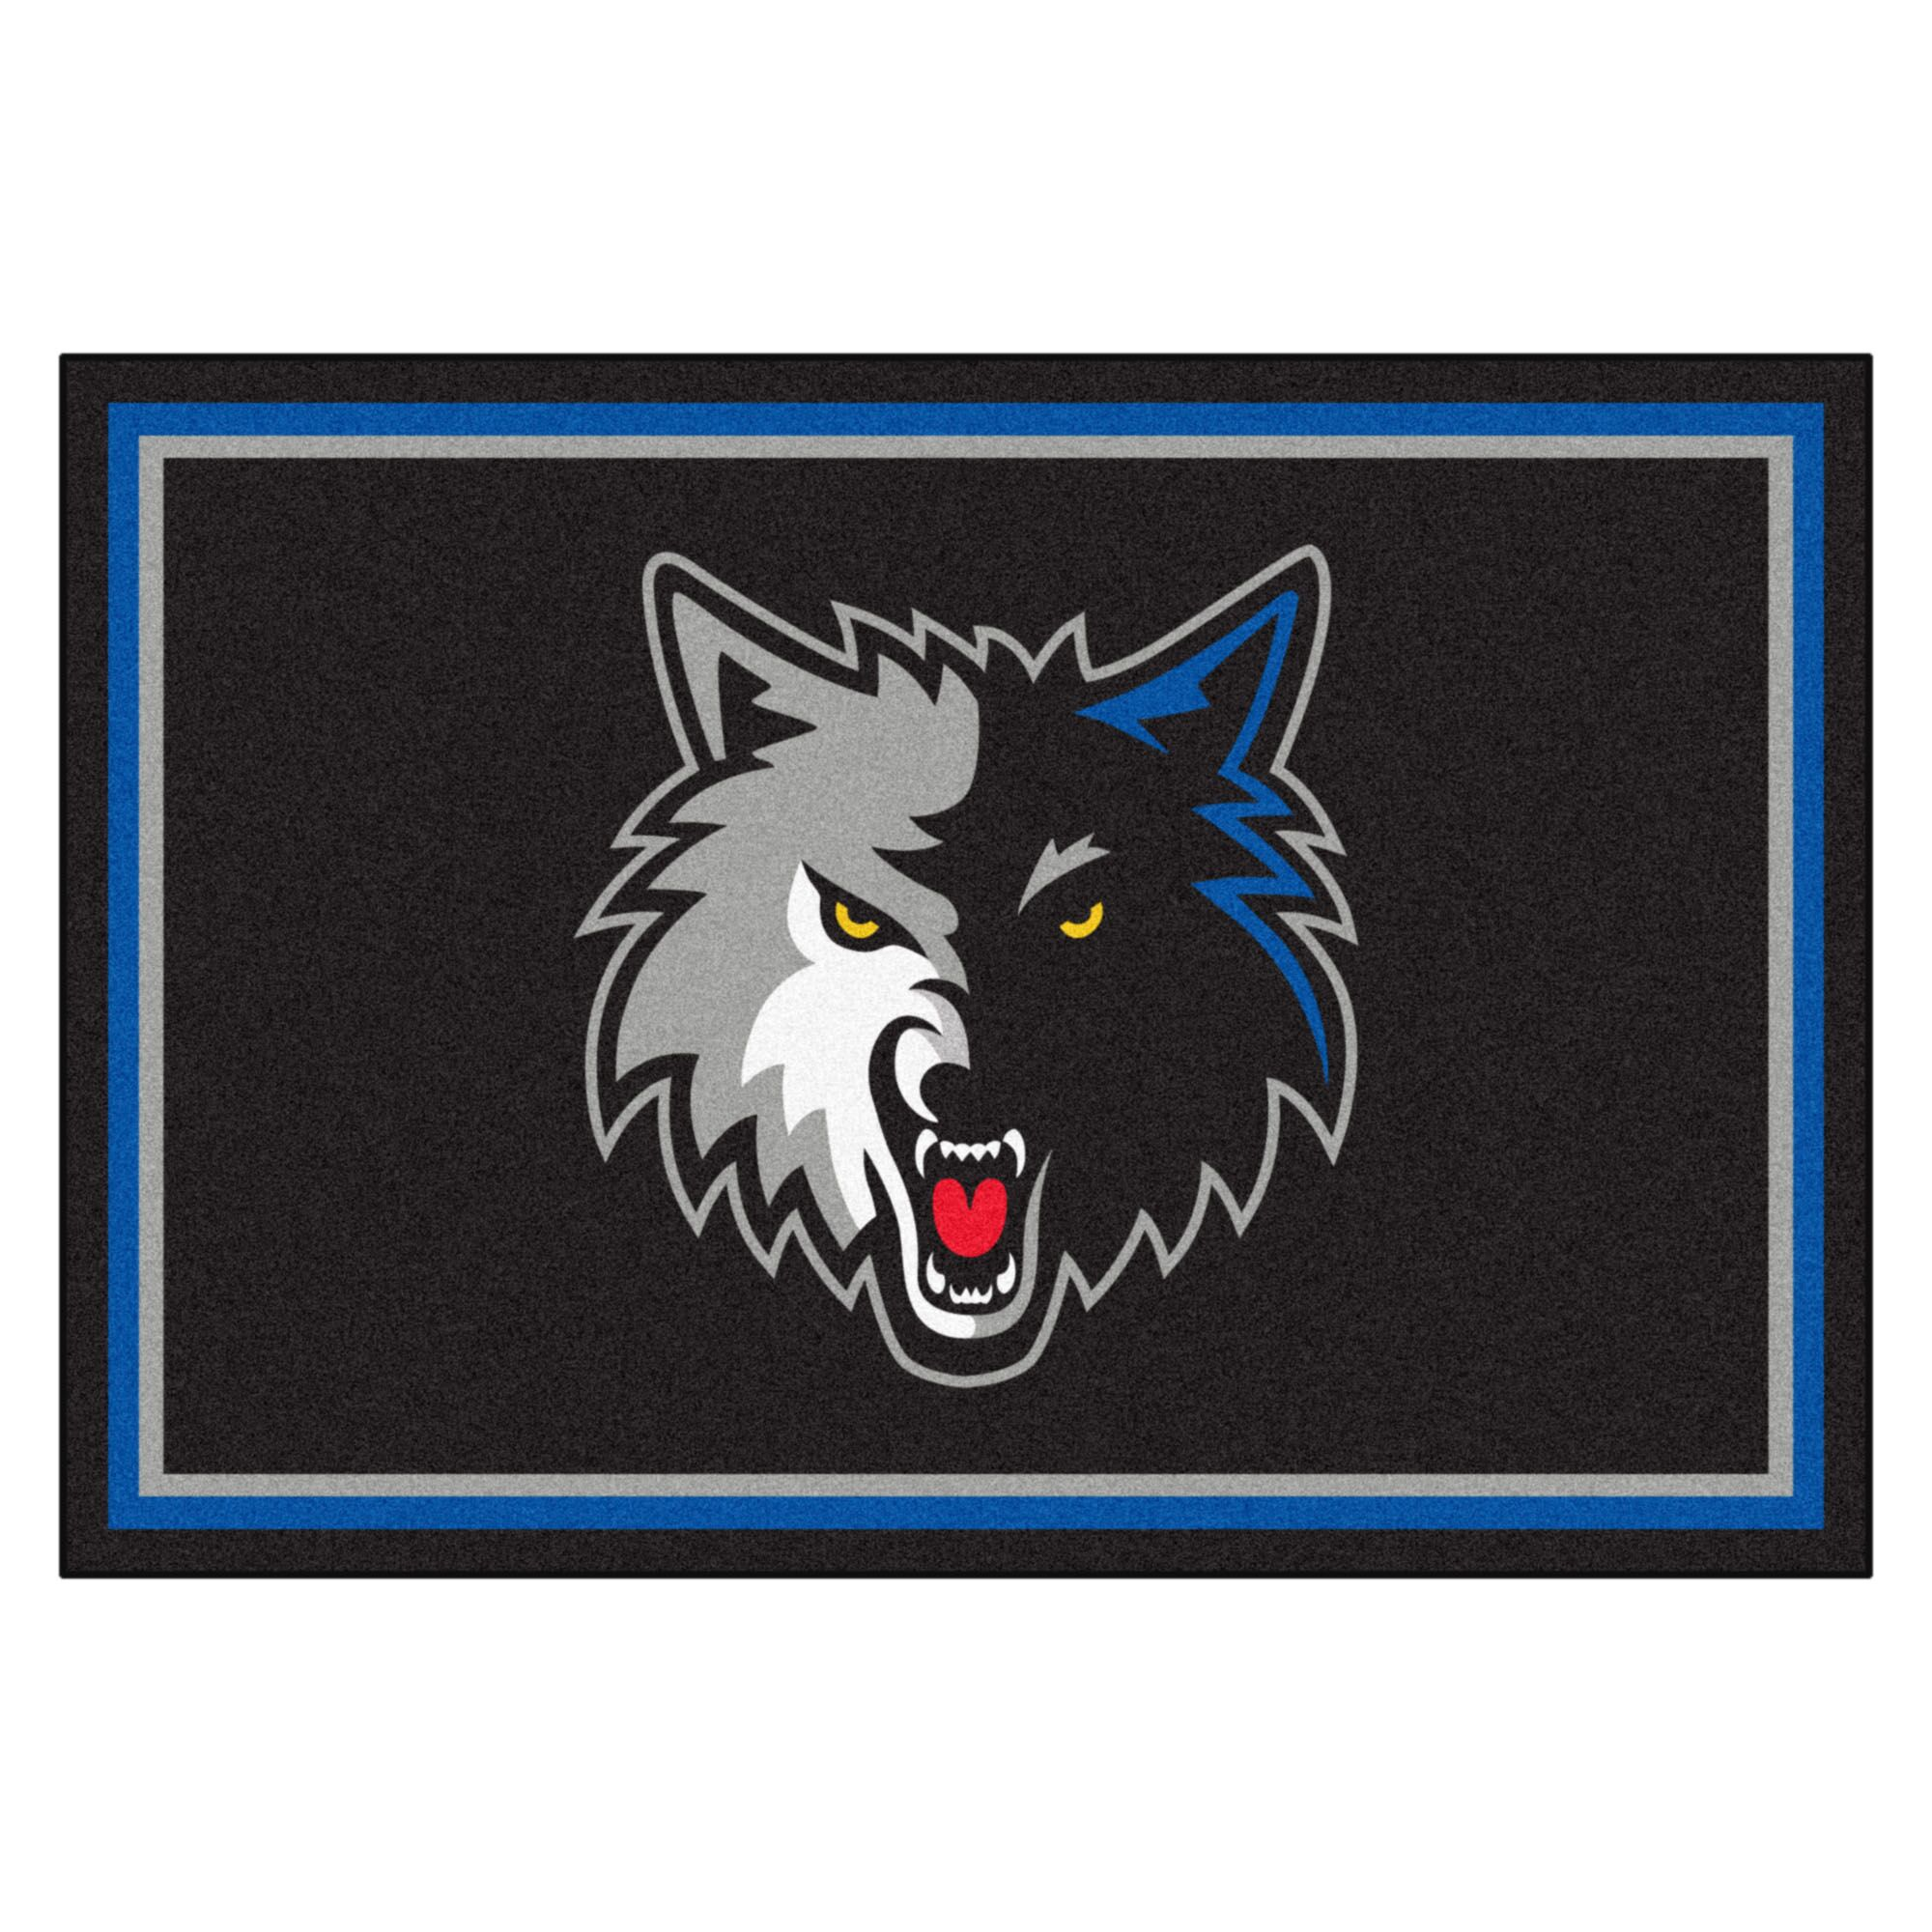 NBA - Minnesota Timberwolves 5x8 Doormat